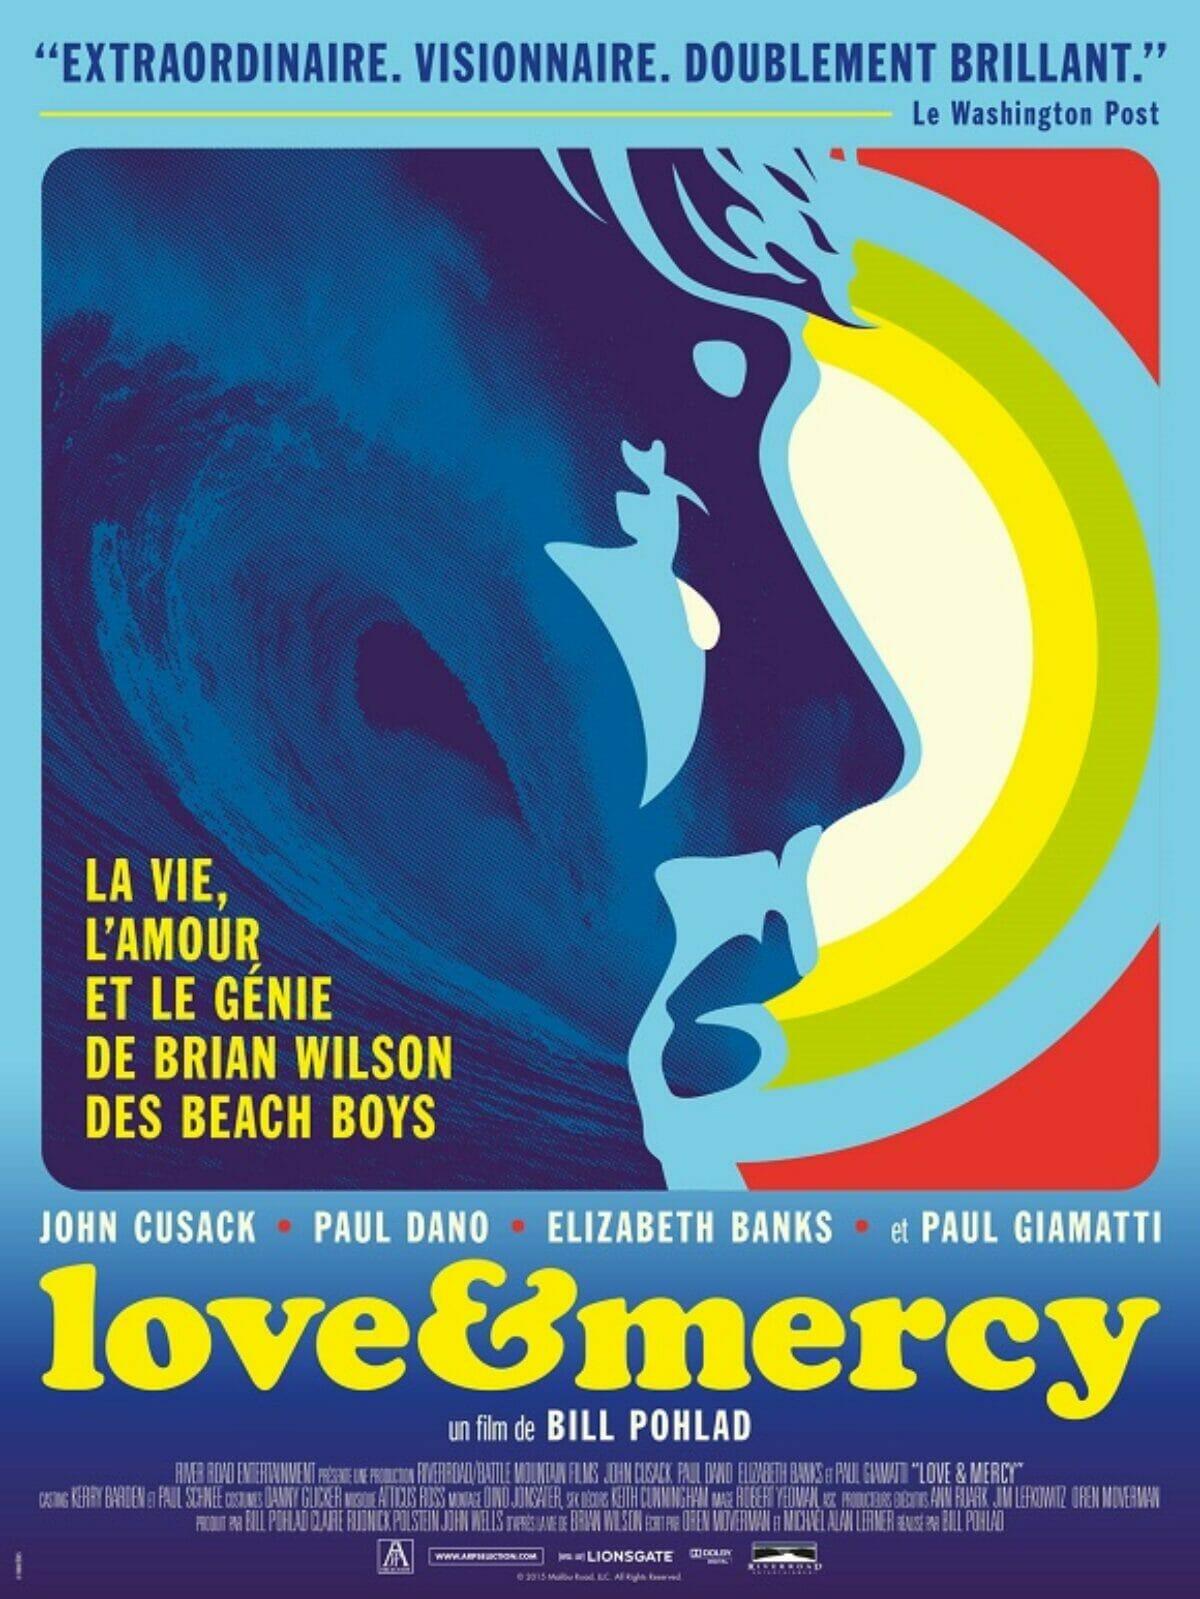 Love-&-mercy-poster